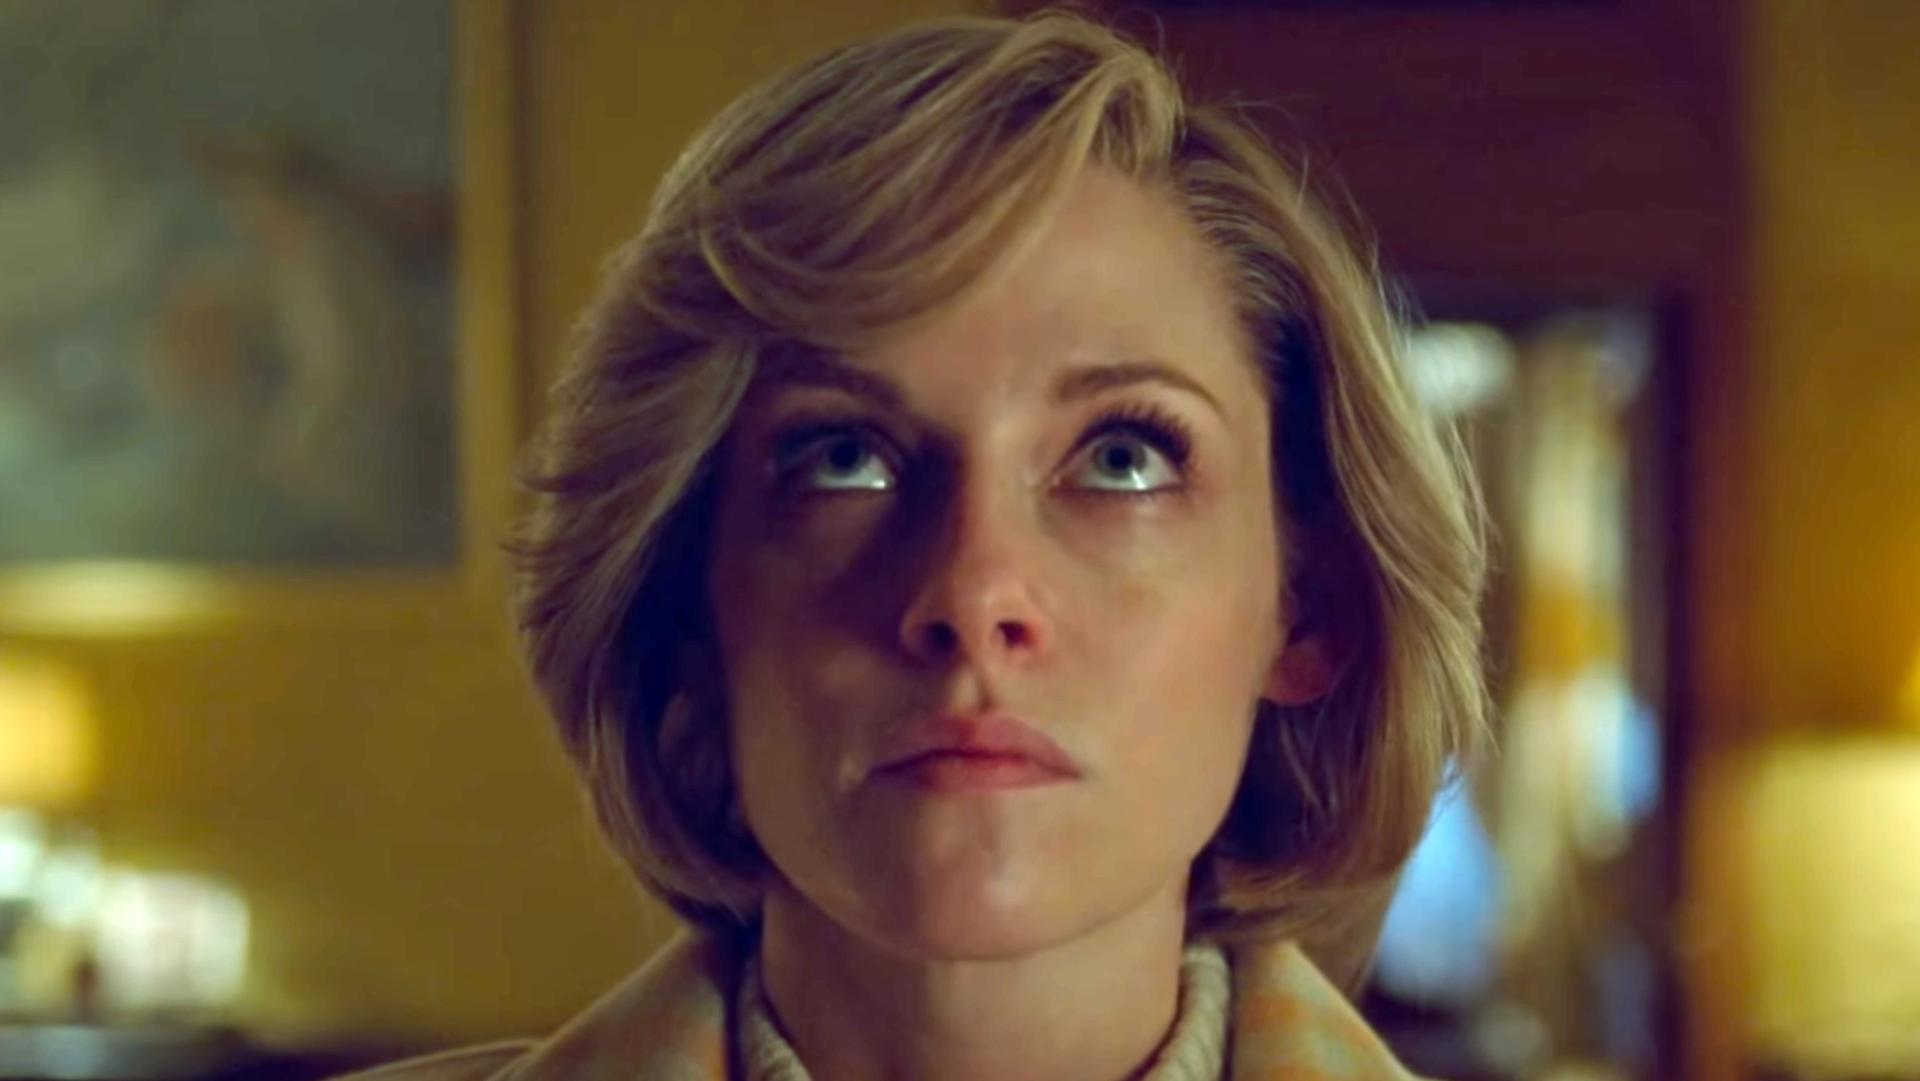 Kristen Stewart en 'Spencer', captura de pantalla - Sputnik Mundo, 1920, 26.08.2021